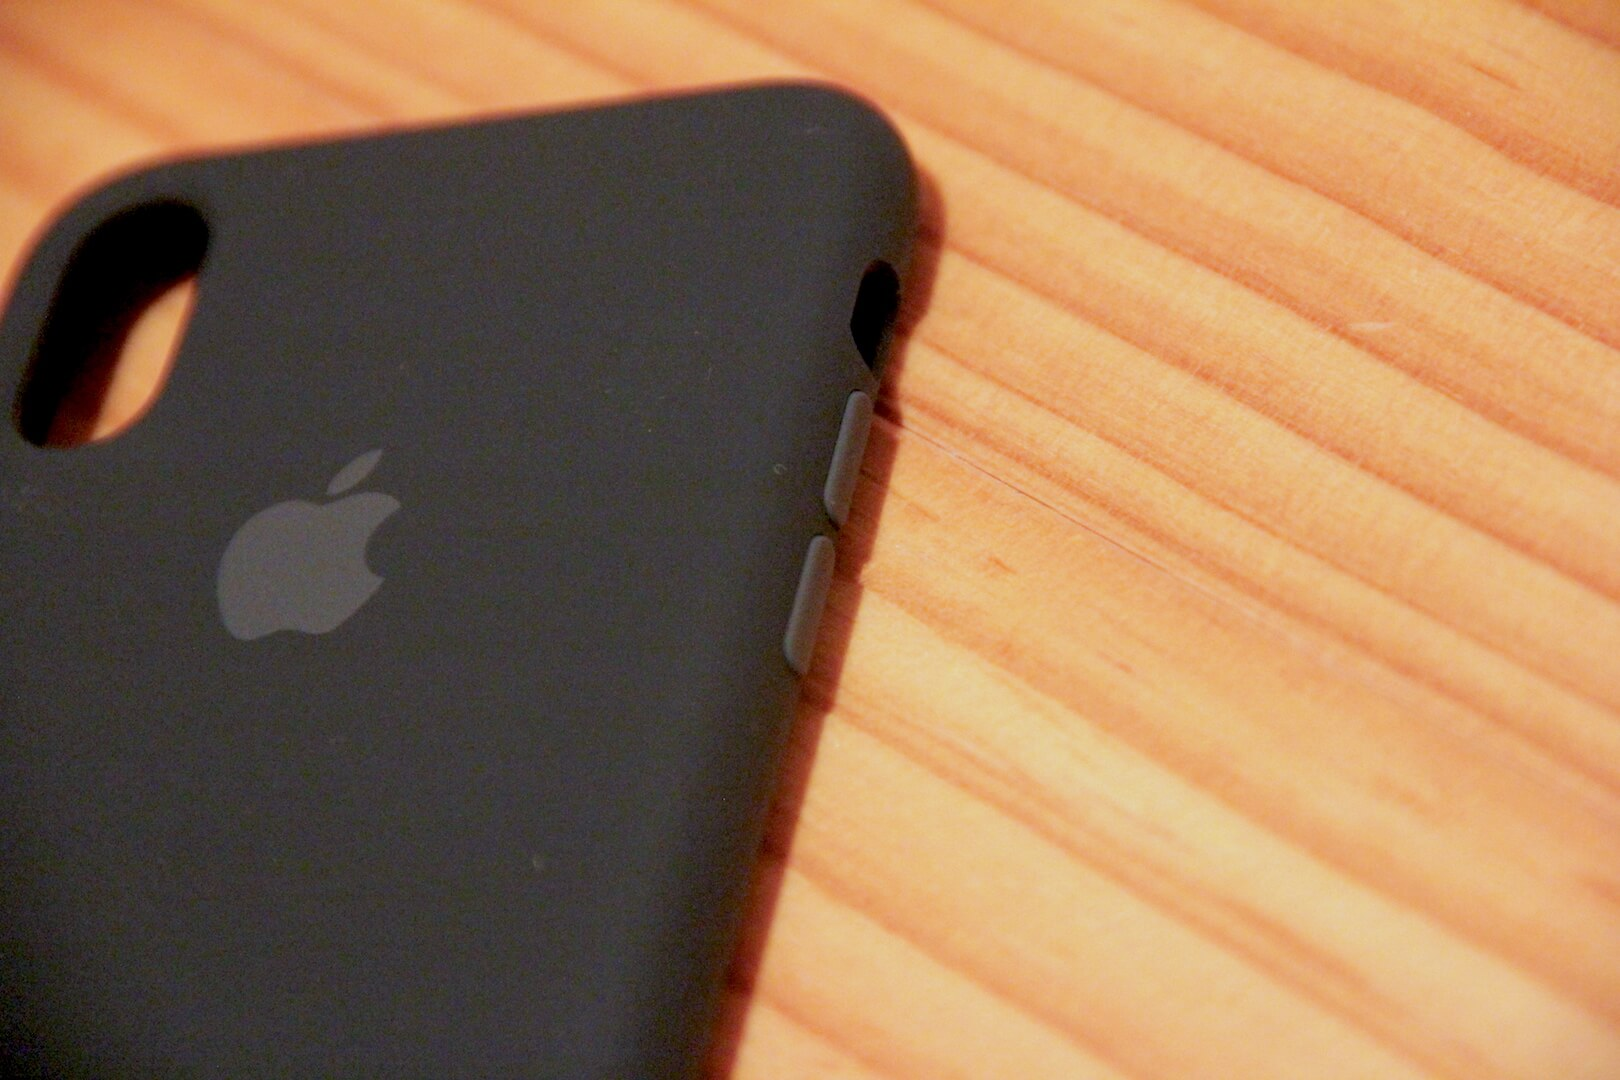 iPhoneXApple純正ケースの音量上げ下げボタンの写真